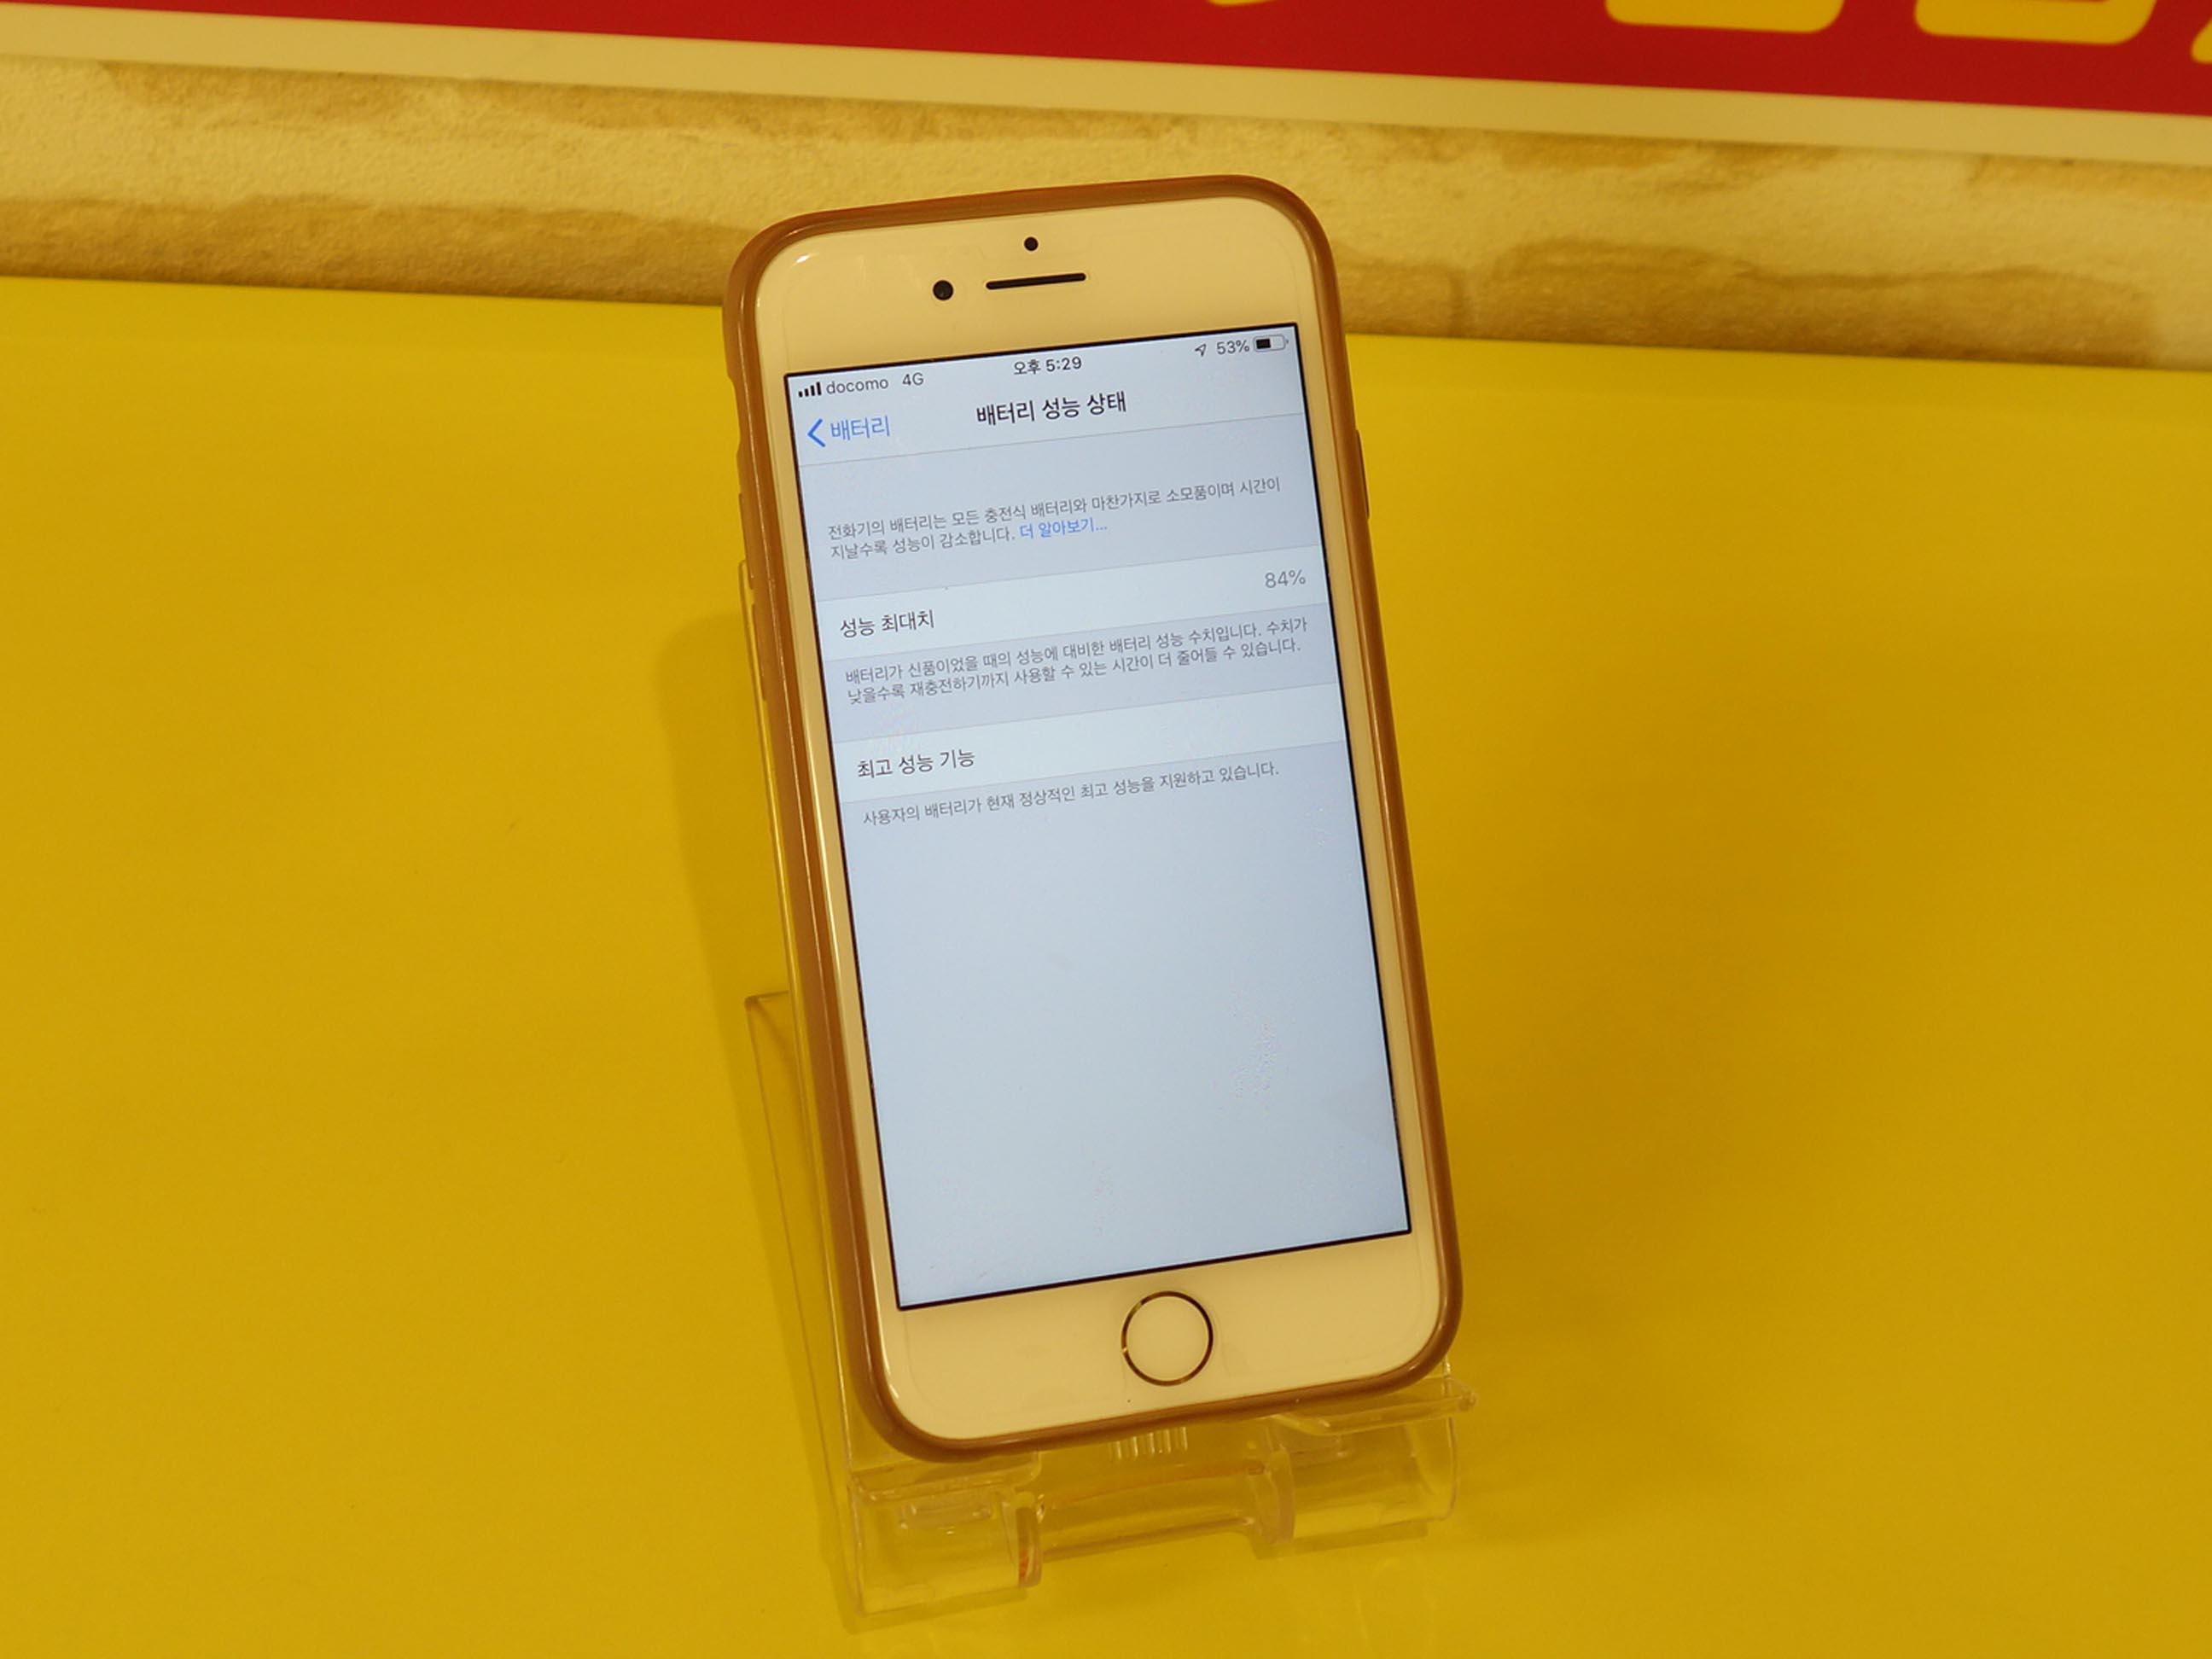 iPhone8のバッテリー交換修理に常滑市からご来店!アイフォン修理のクイック名古屋